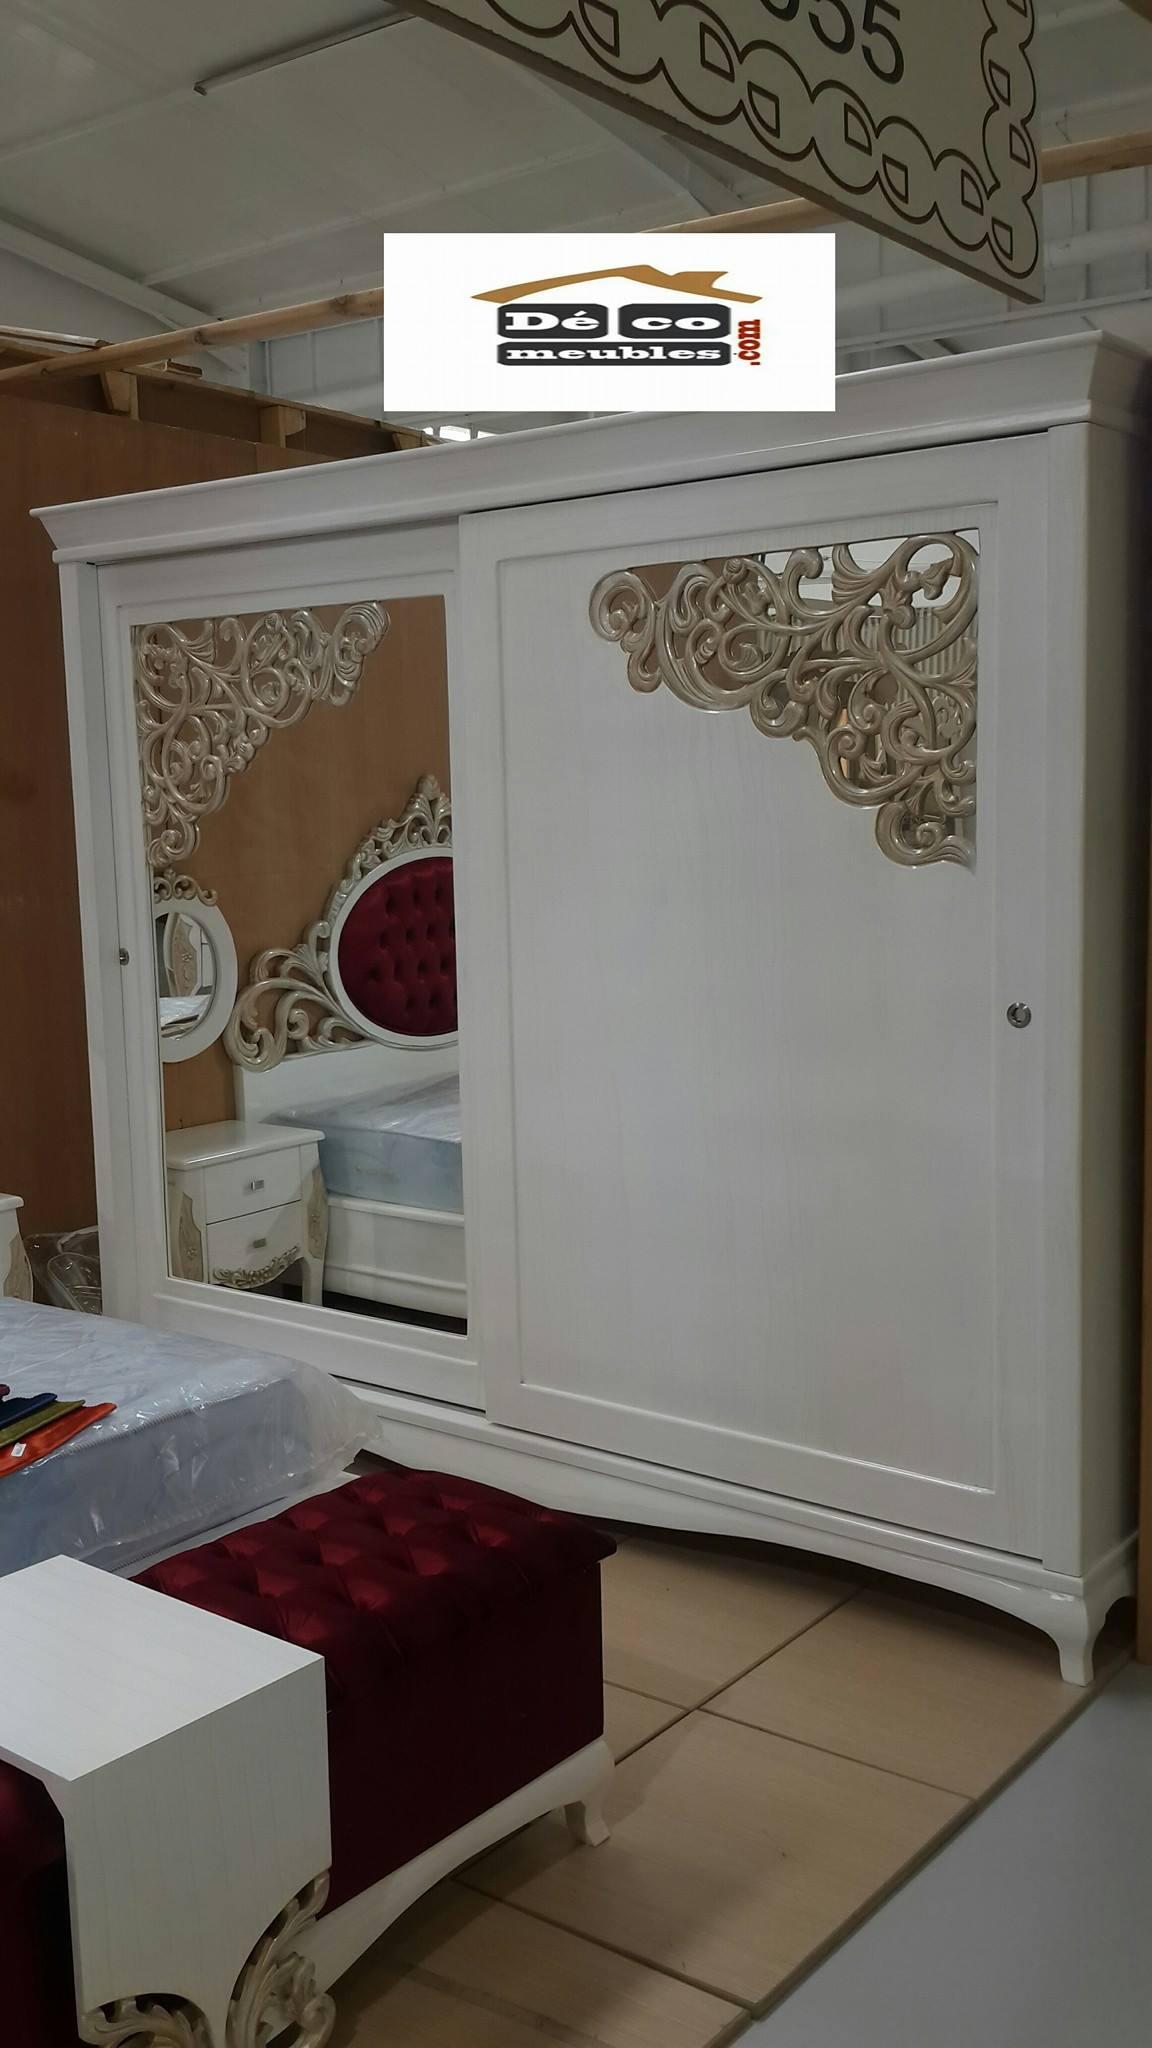 Chambre a coucher en tunisie 032227 la for Chambre coucher tunisie